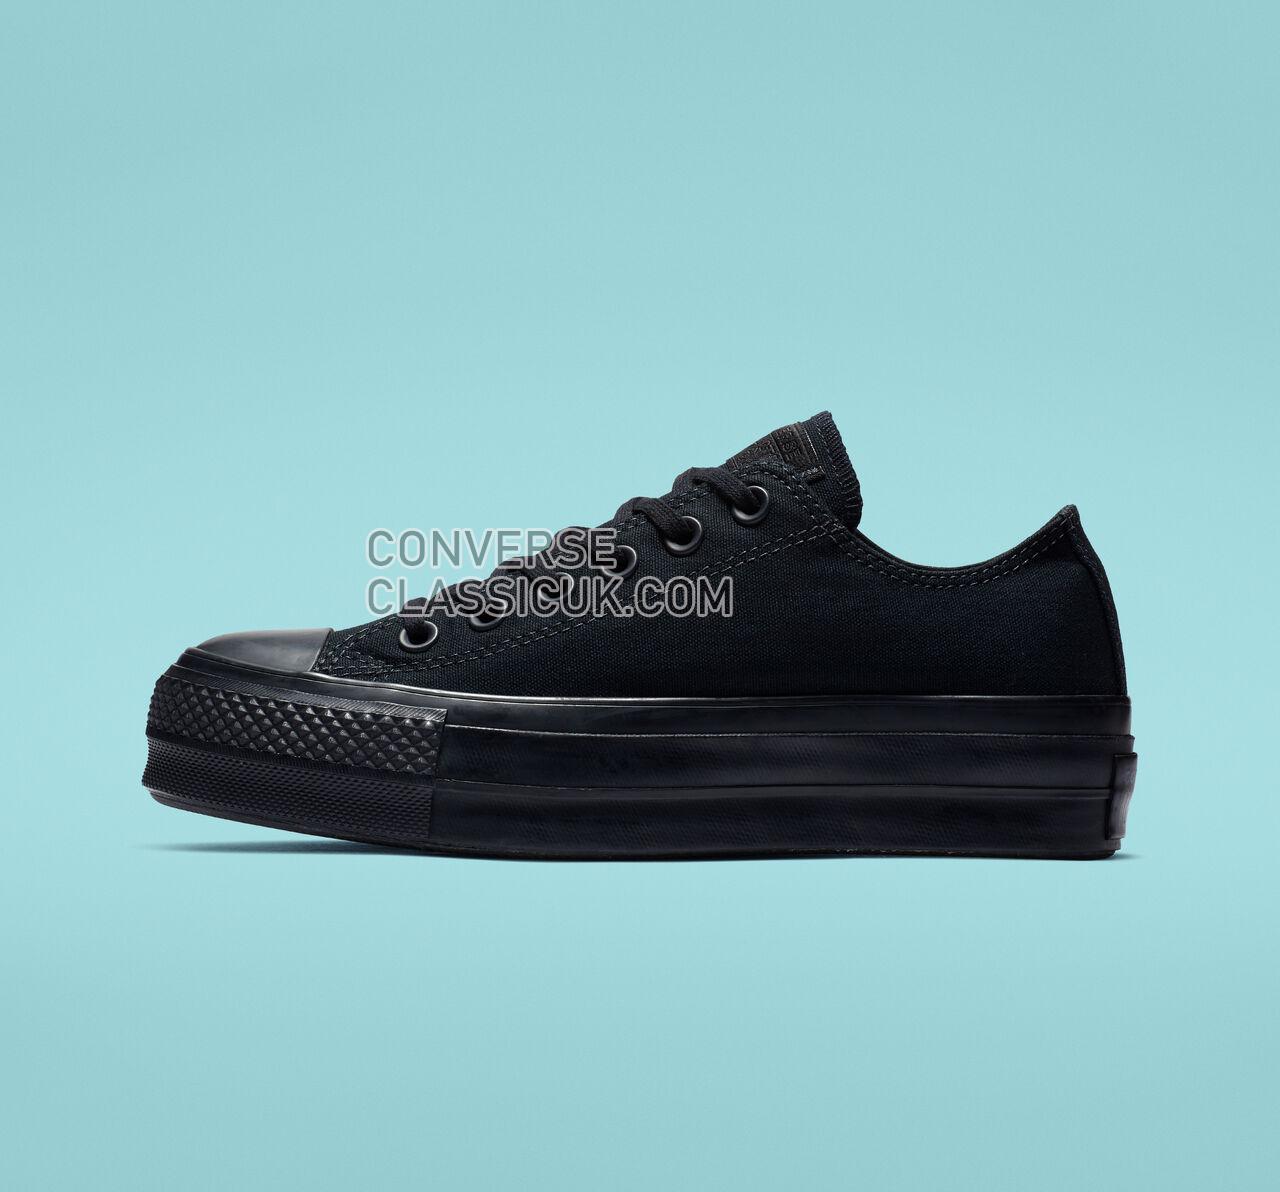 Converse Chuck Taylor All Star Platform Low Top Womens 562926C Black/Black/Black Shoes